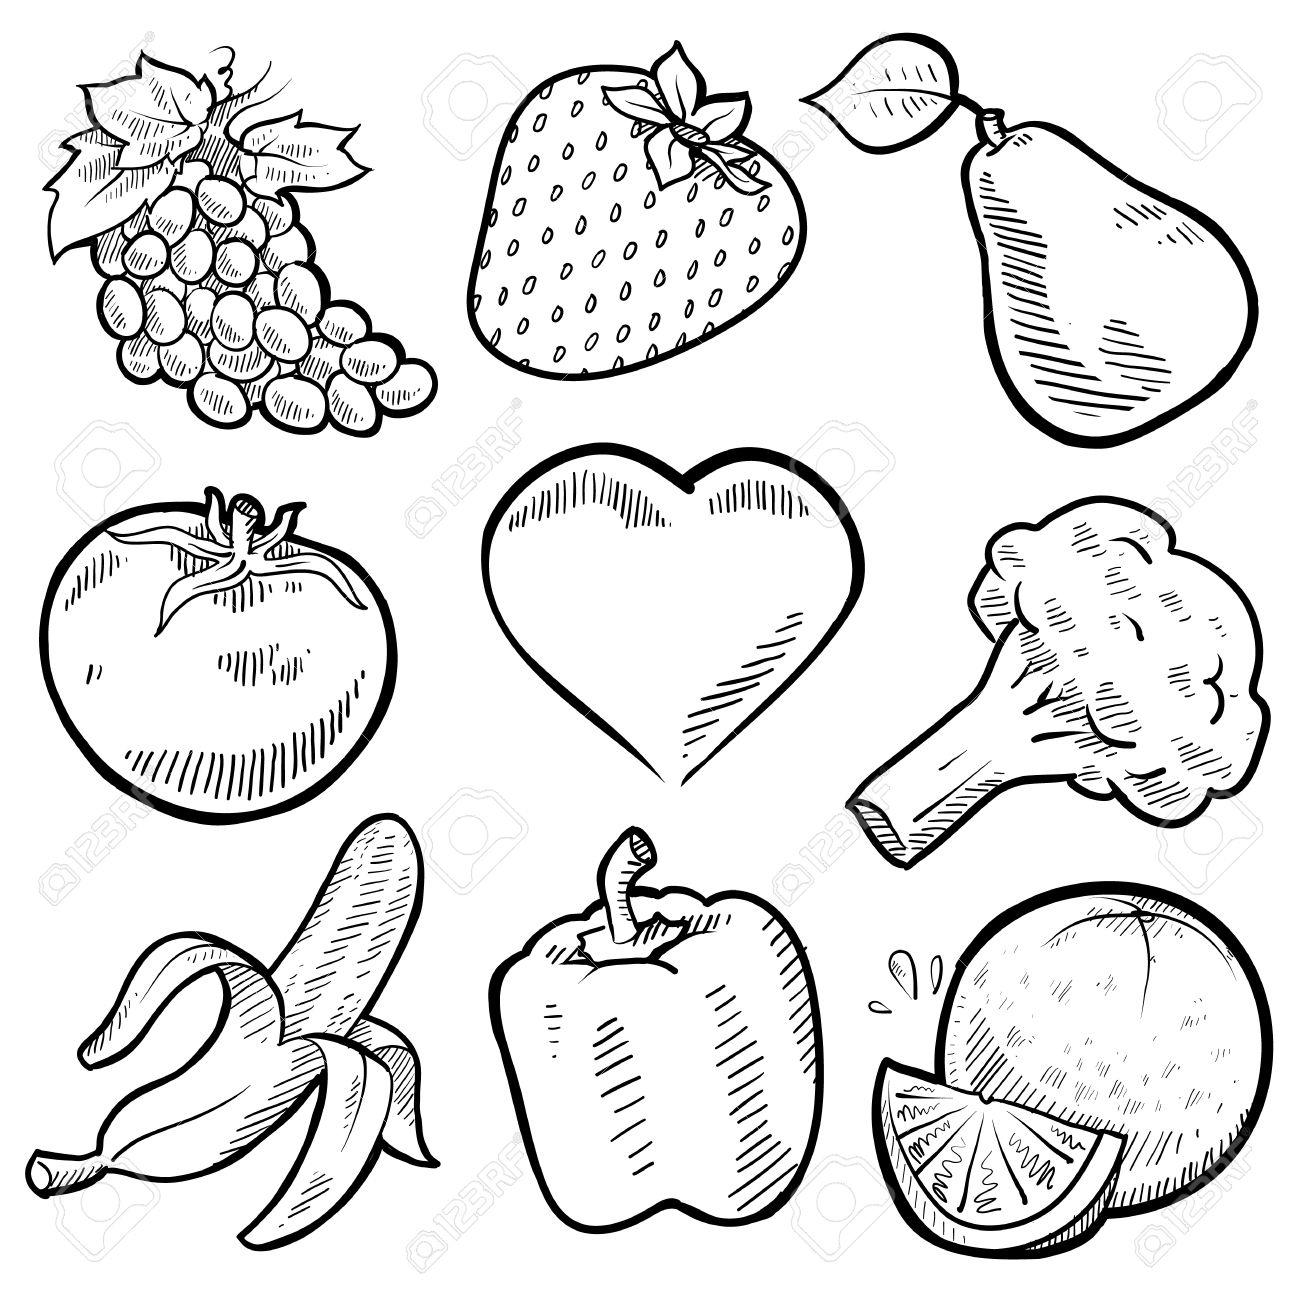 Line Art Vegetables : Vegetables line drawing at getdrawings free for